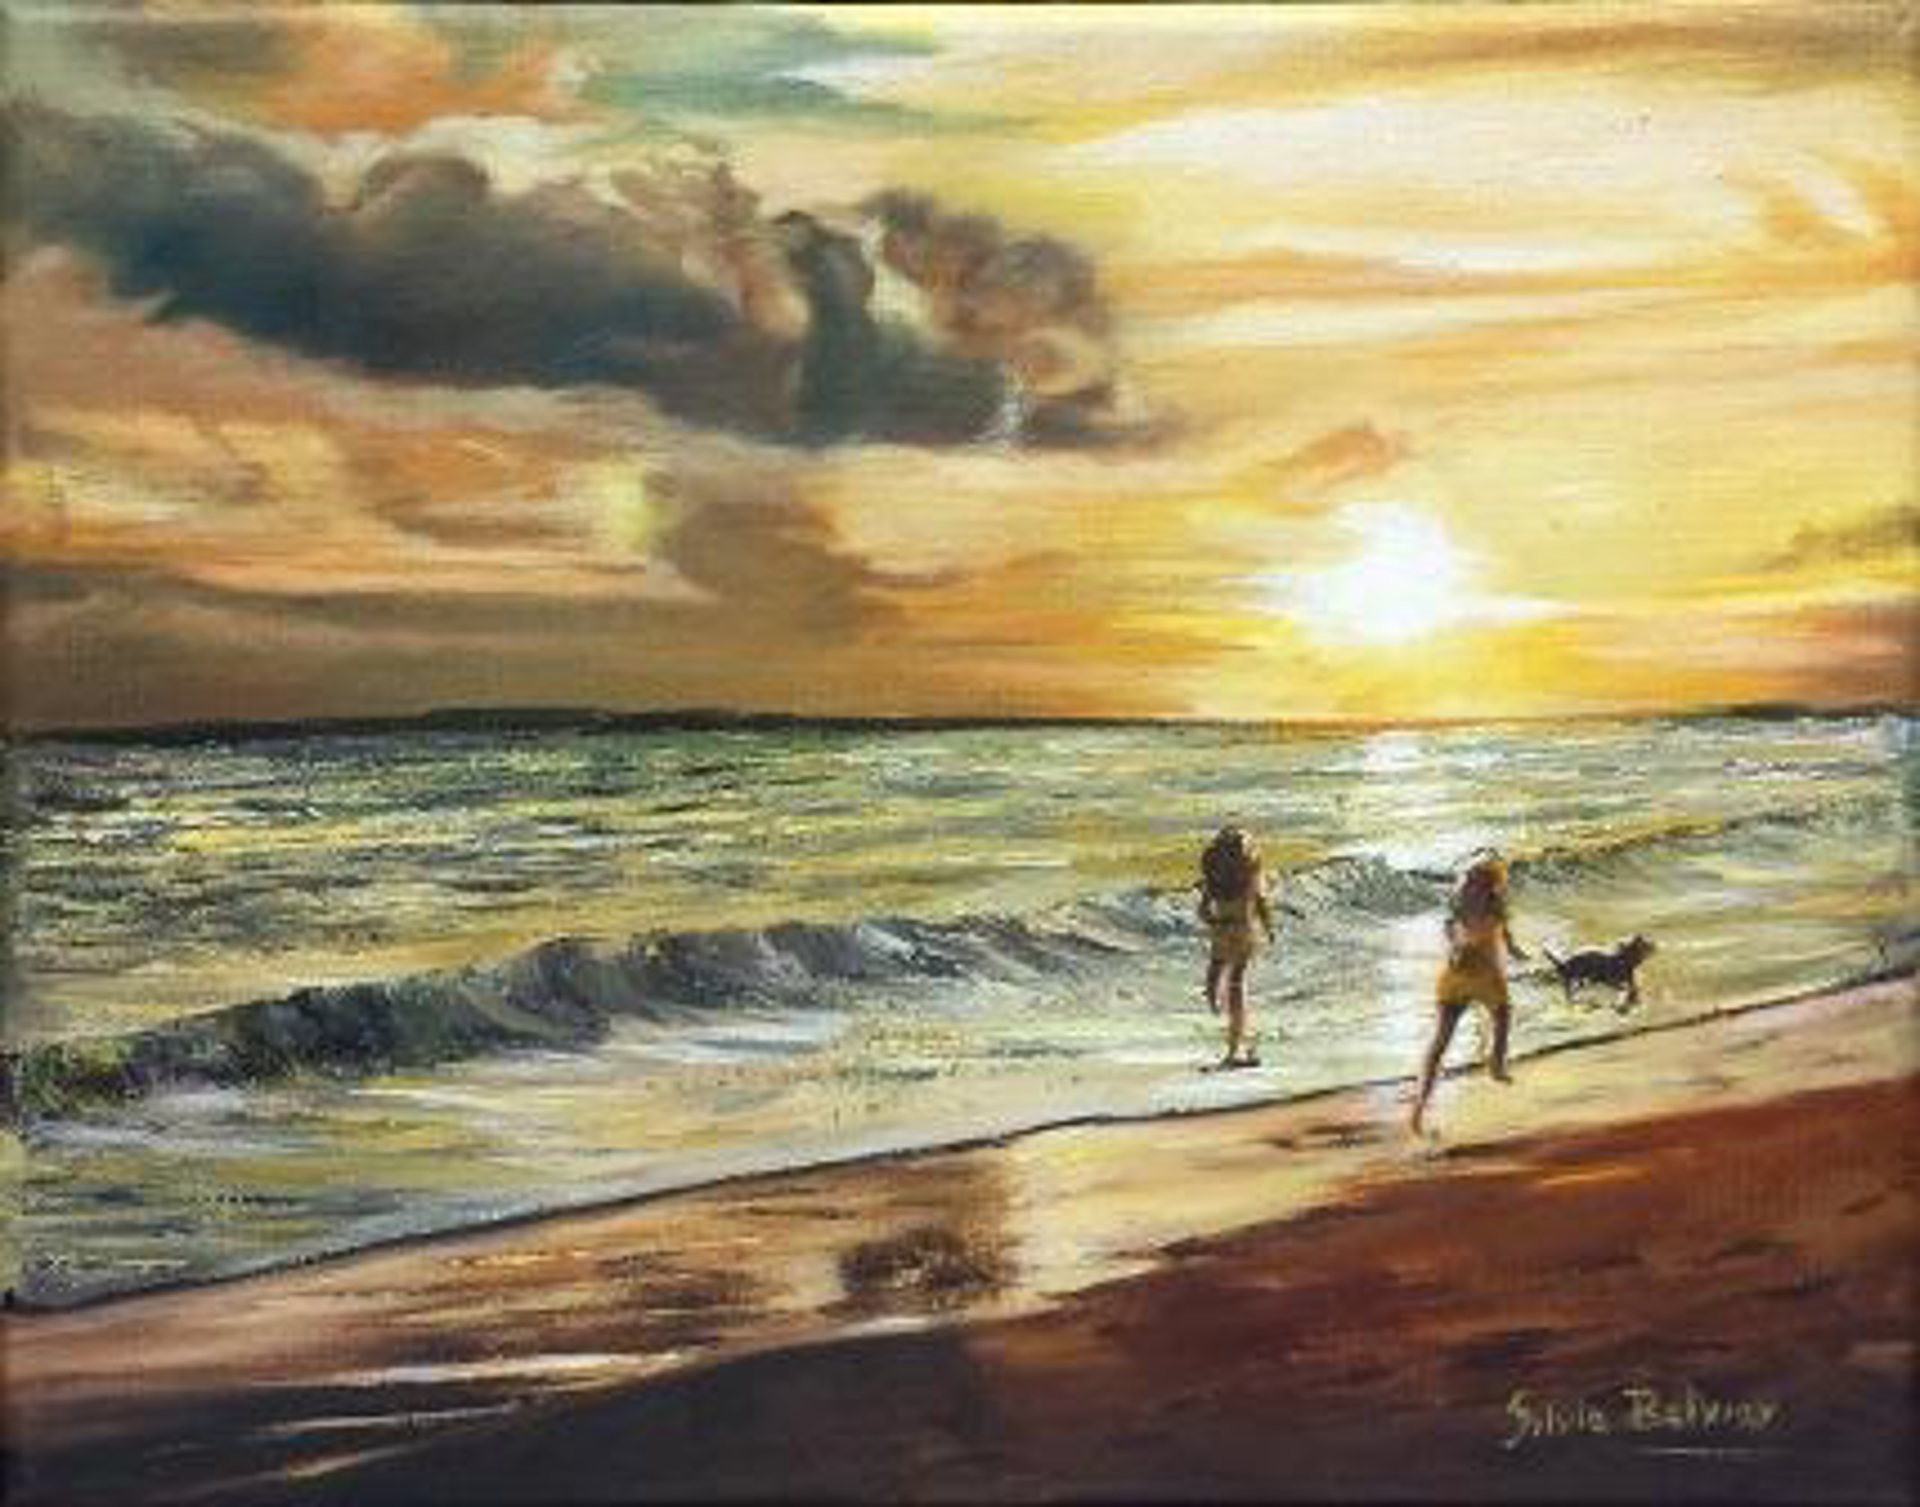 Fun on the Beach by Silvia Belviso